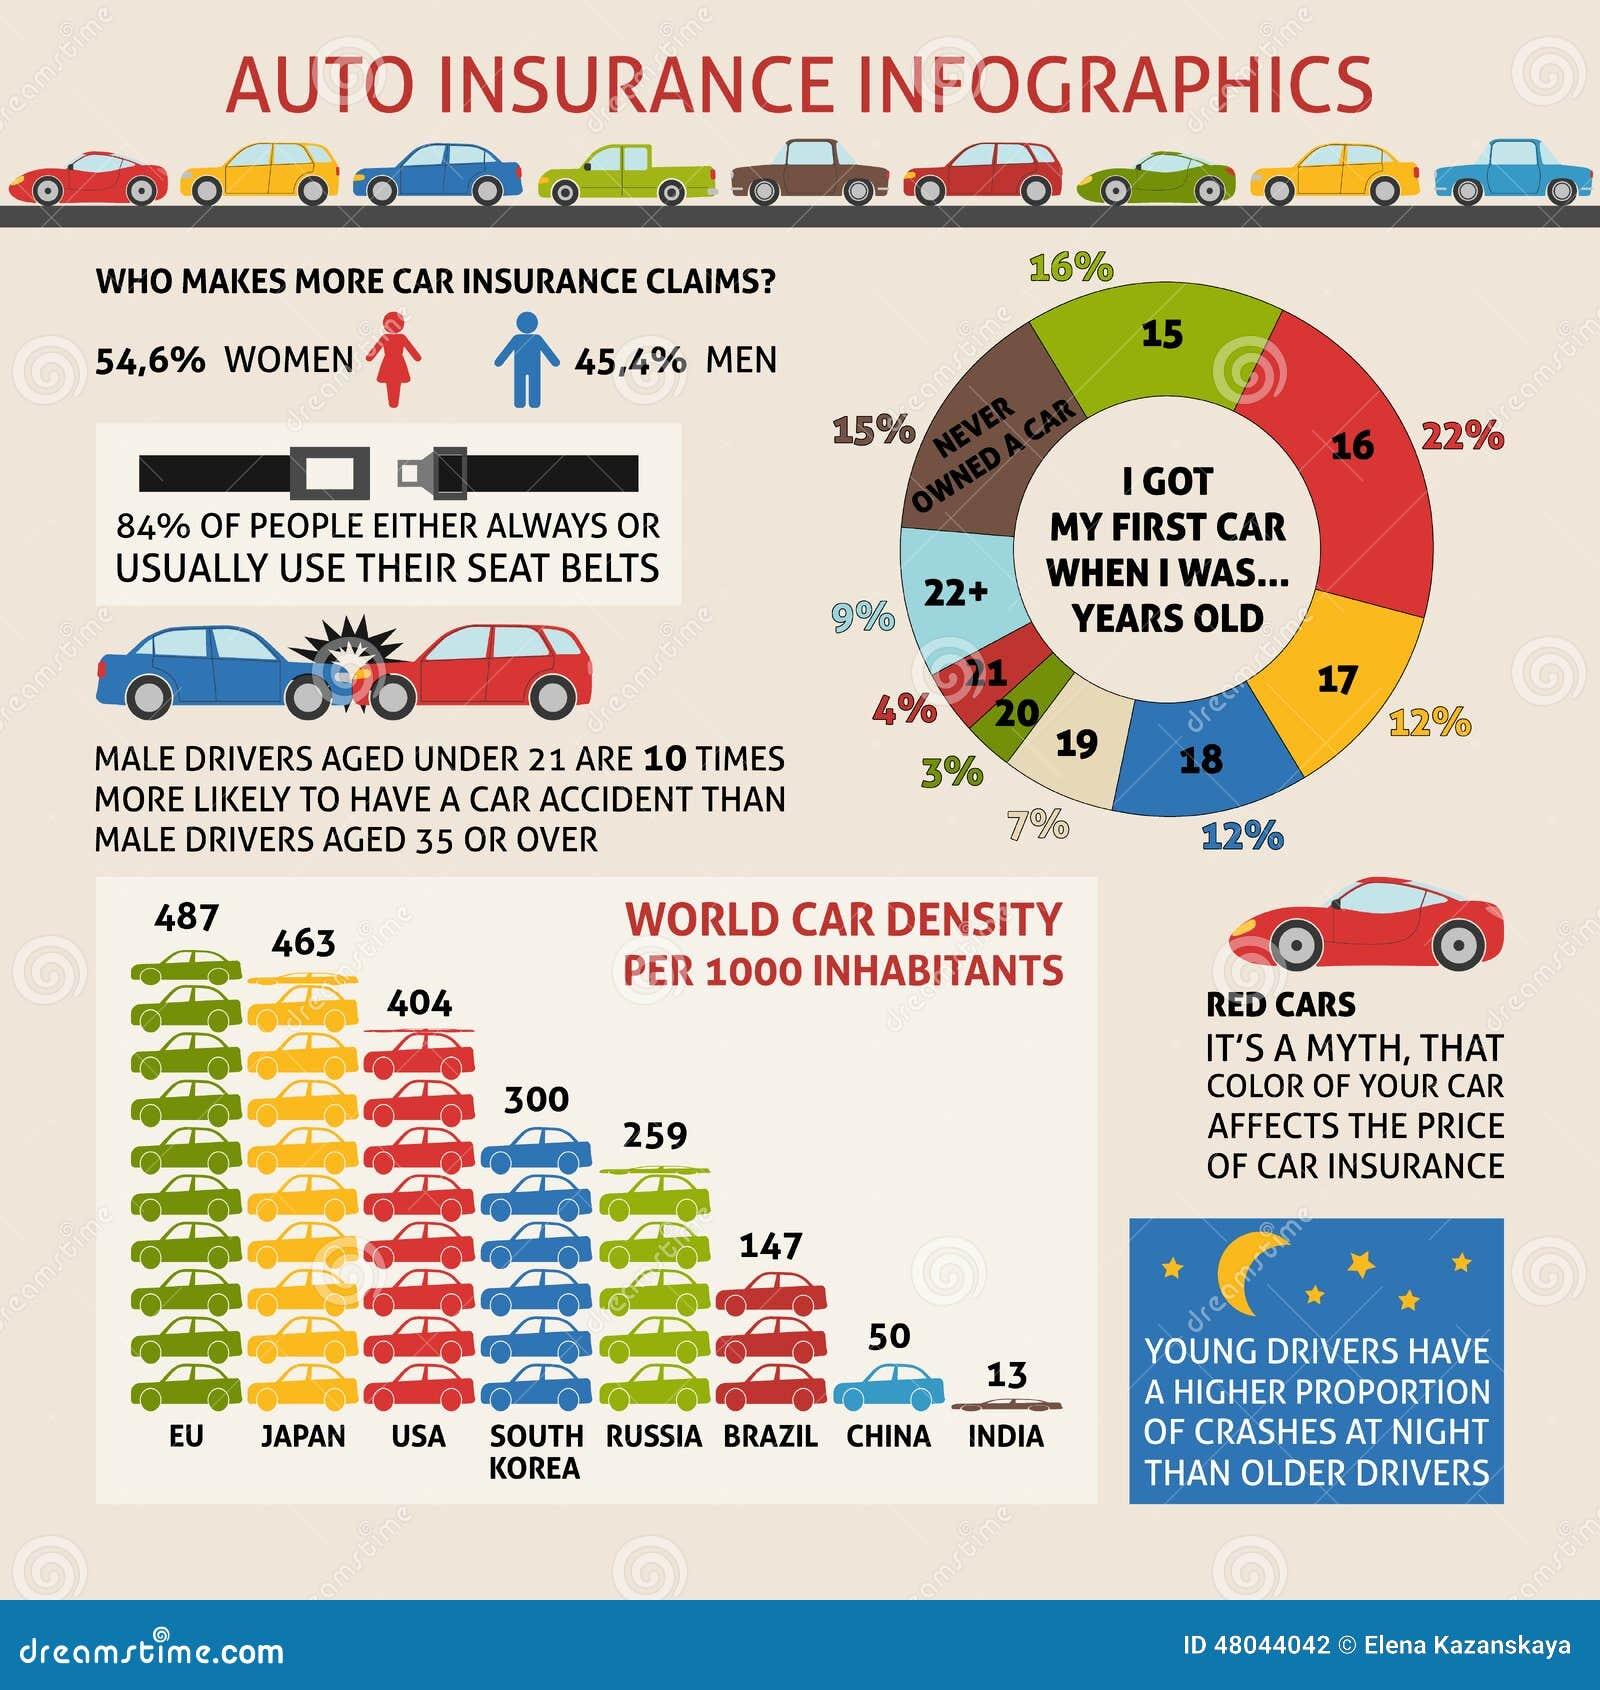 Auto Insurance Infographics Stock Vector - Image: 48044042